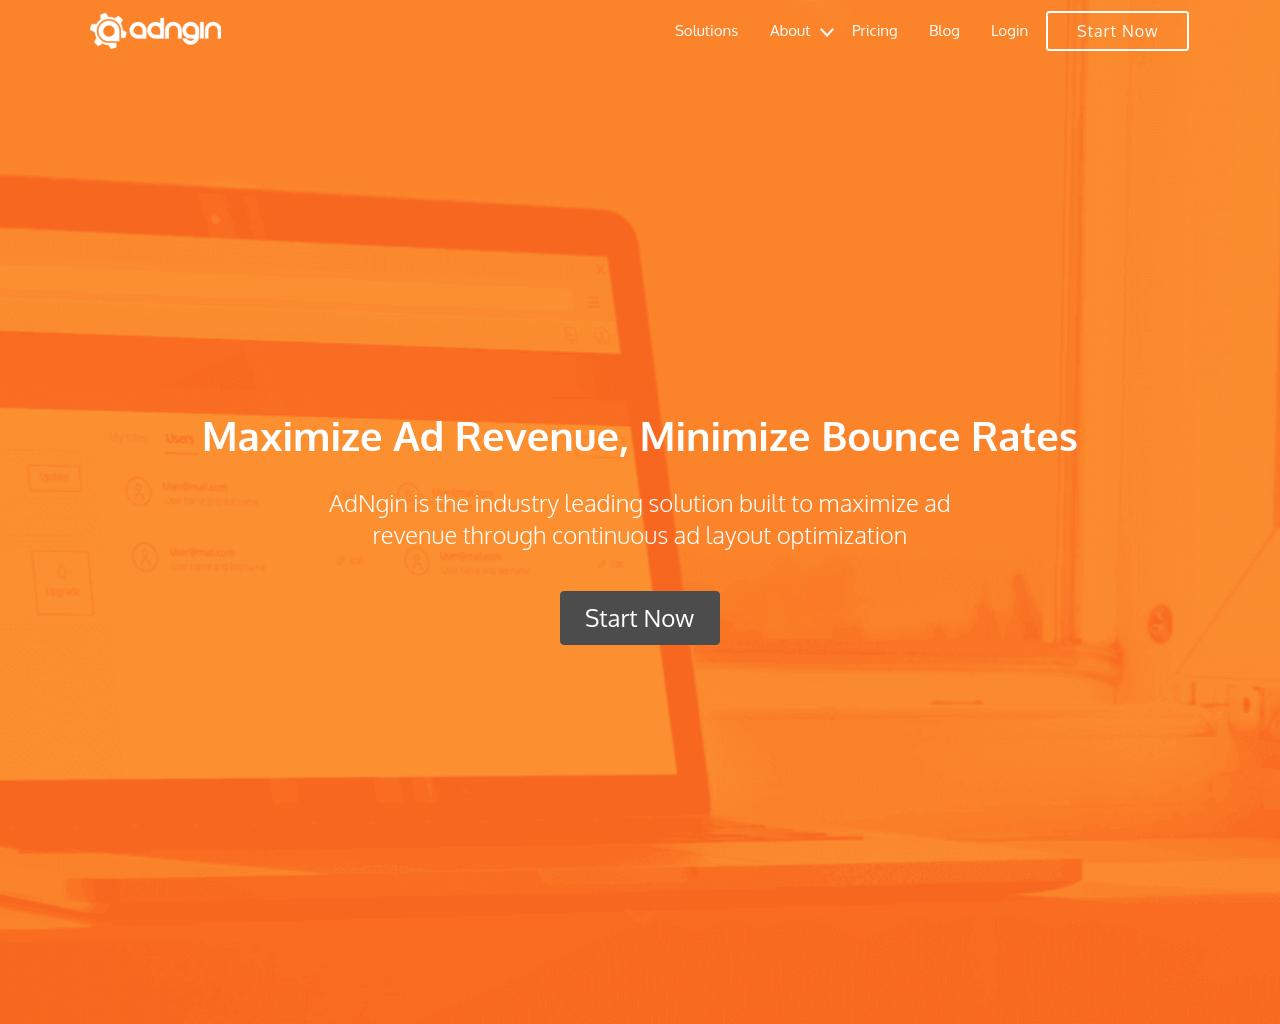 AdNgin-Advertising-Reviews-Pricing